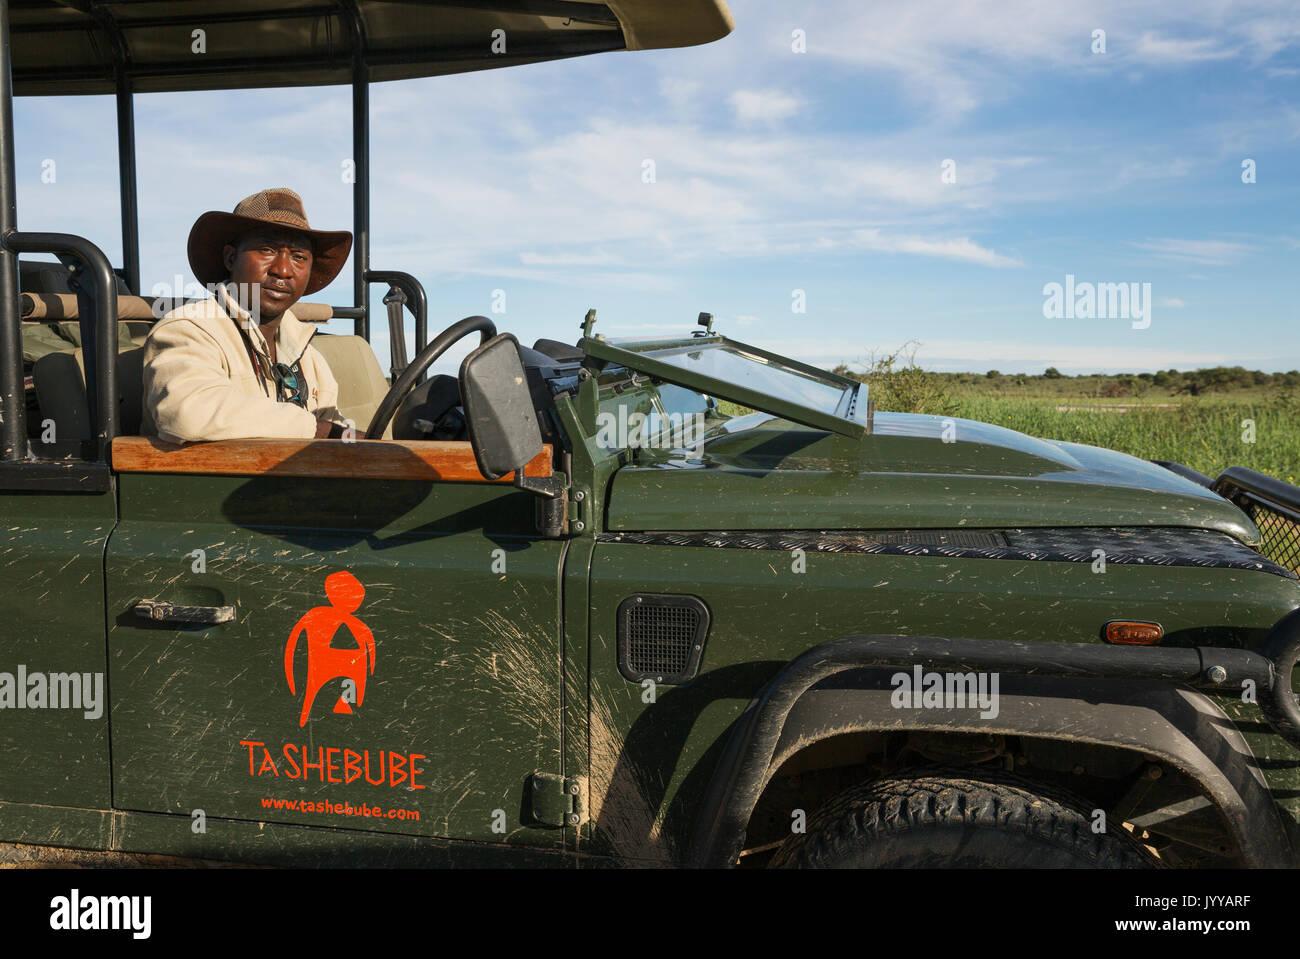 A driver and guide in a safari jeep, Kalahari Desert, Kgalagadi Transfrontier Park, Botswana - Stock Image